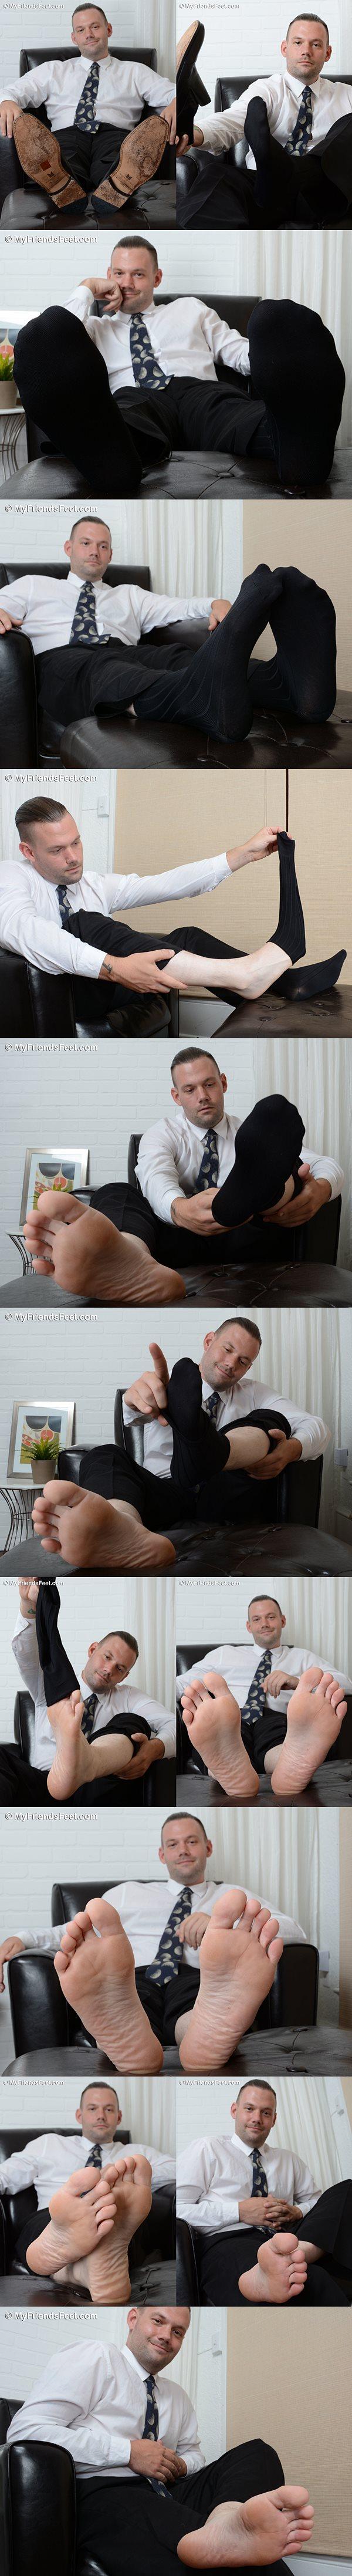 Jacky's dress socks and bare feet at Myfriendsfeet